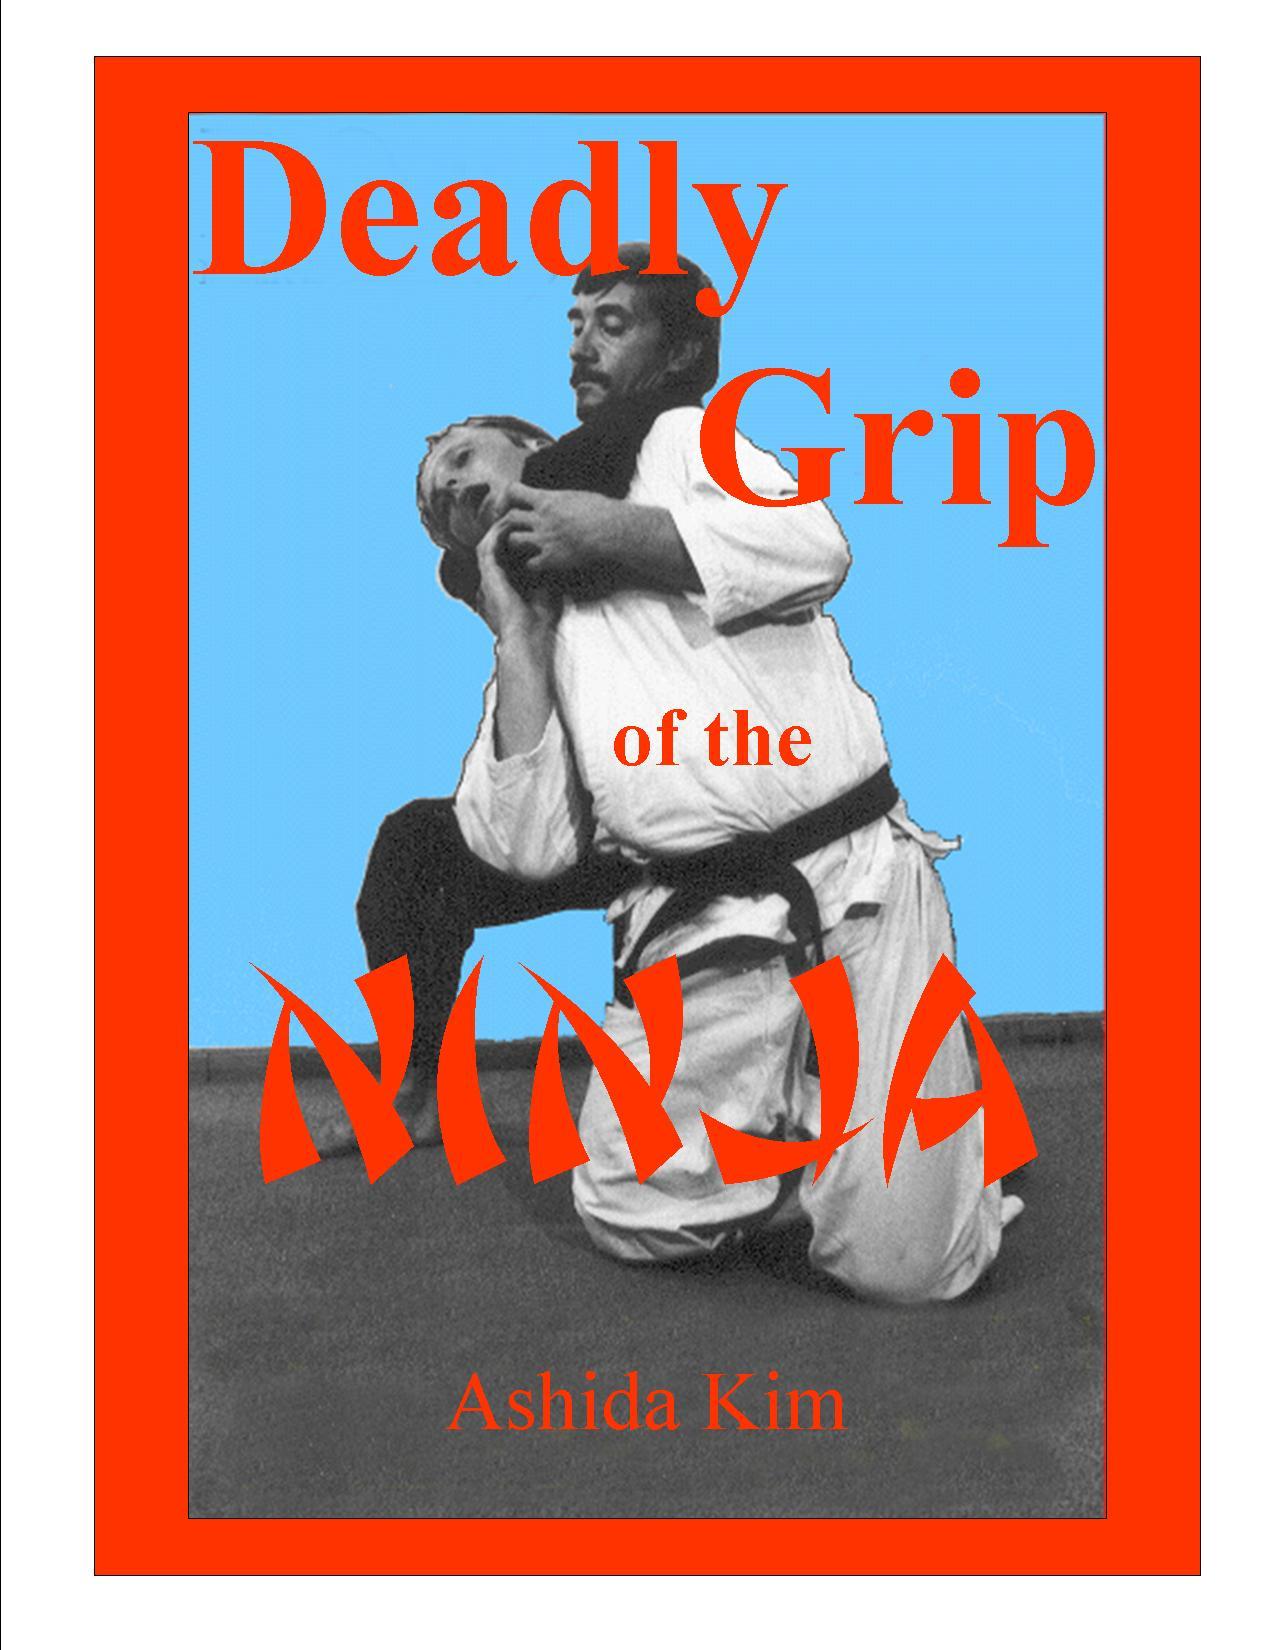 DEADLY GRIP OF THE NINJA